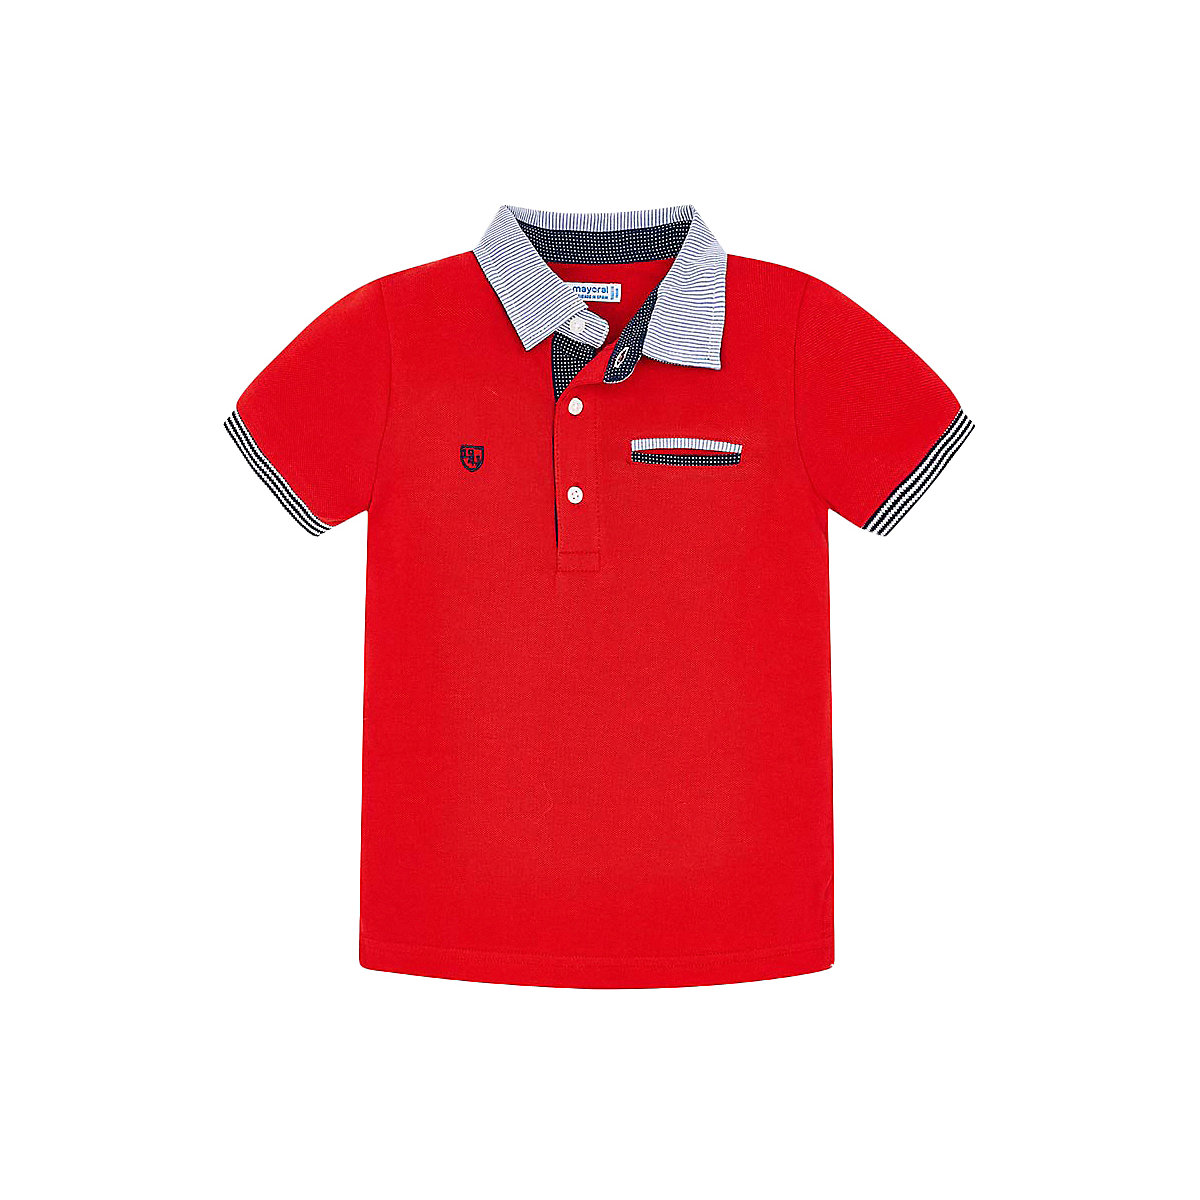 MAYORAL Polo Shirts 10691165 children clothing t-shirt shirt the print for boys tiger 3d print basic t shirt